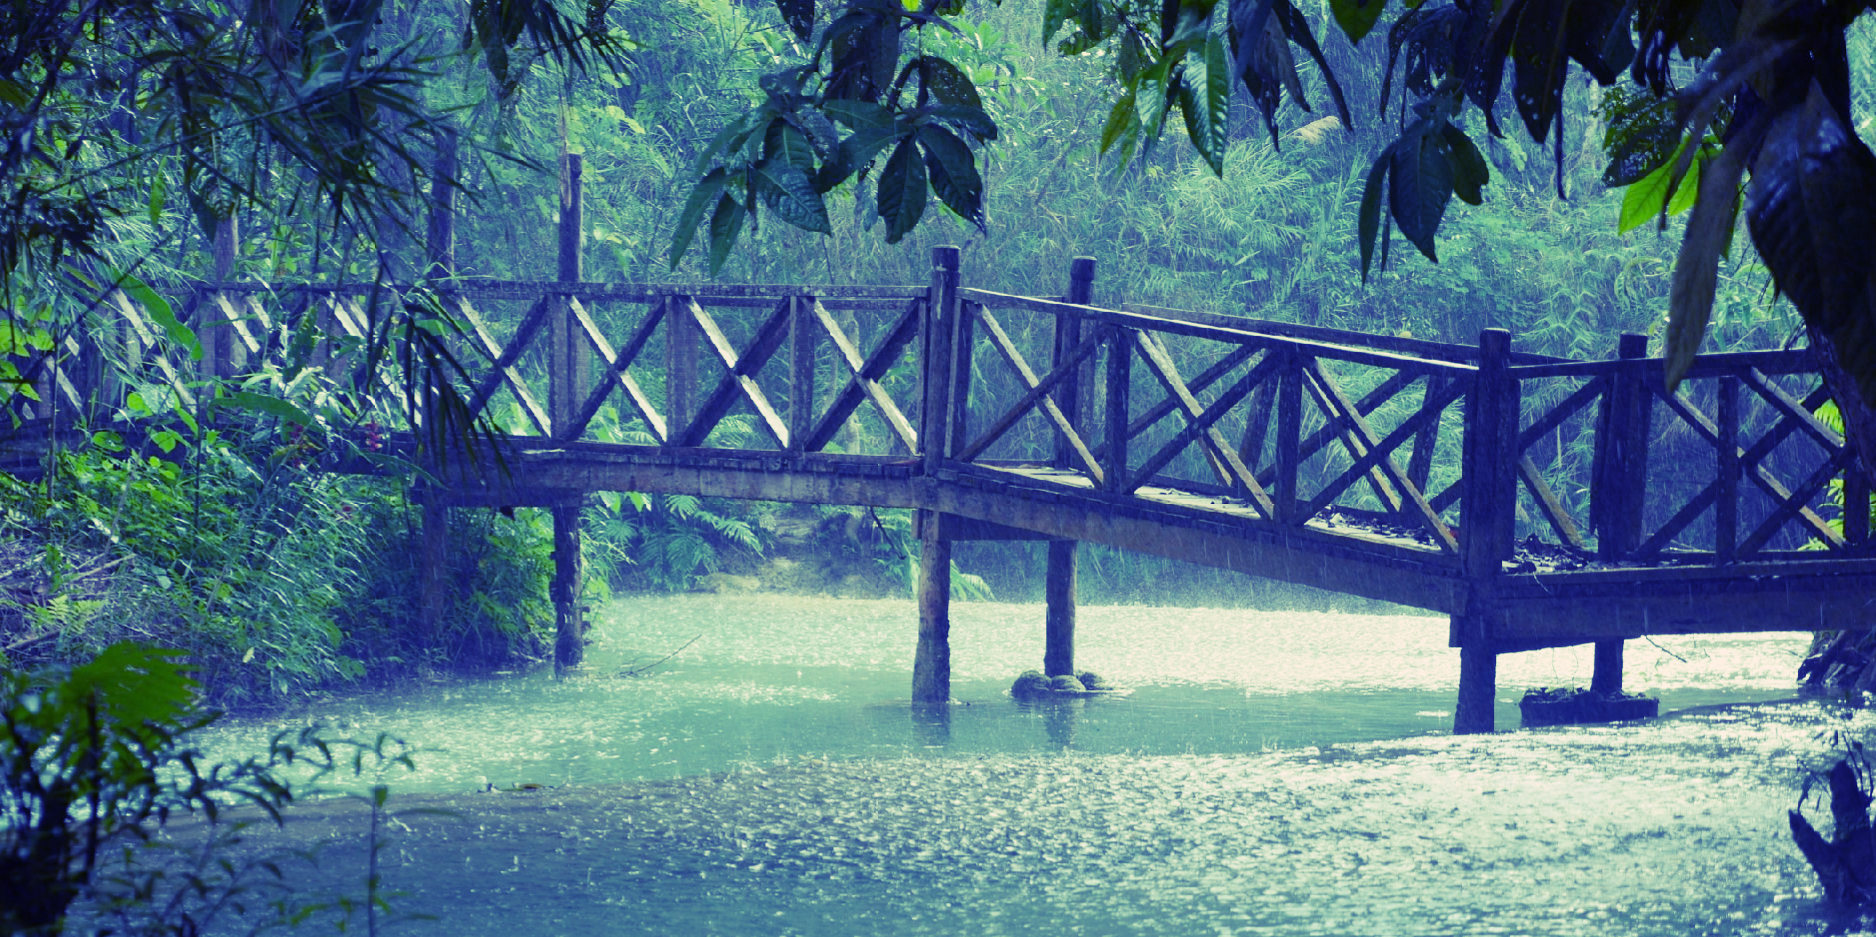 64. Tropenregen (Laos)